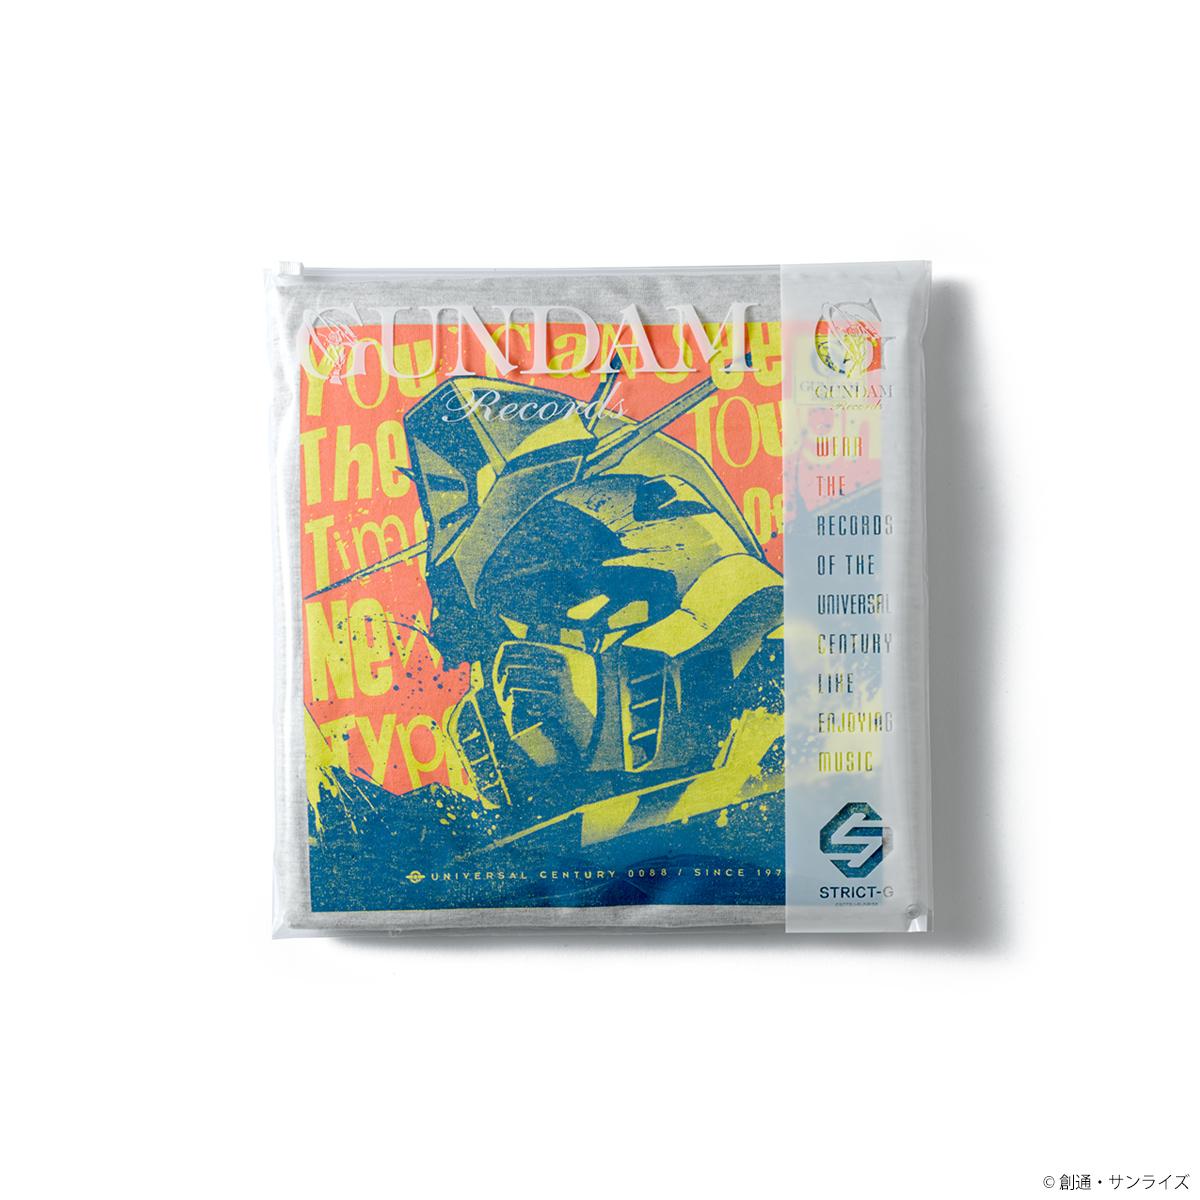 STRICT-G 新企画 Tシャツコレクション「GUNDAM RECORDS」シリーズ第一弾発売!